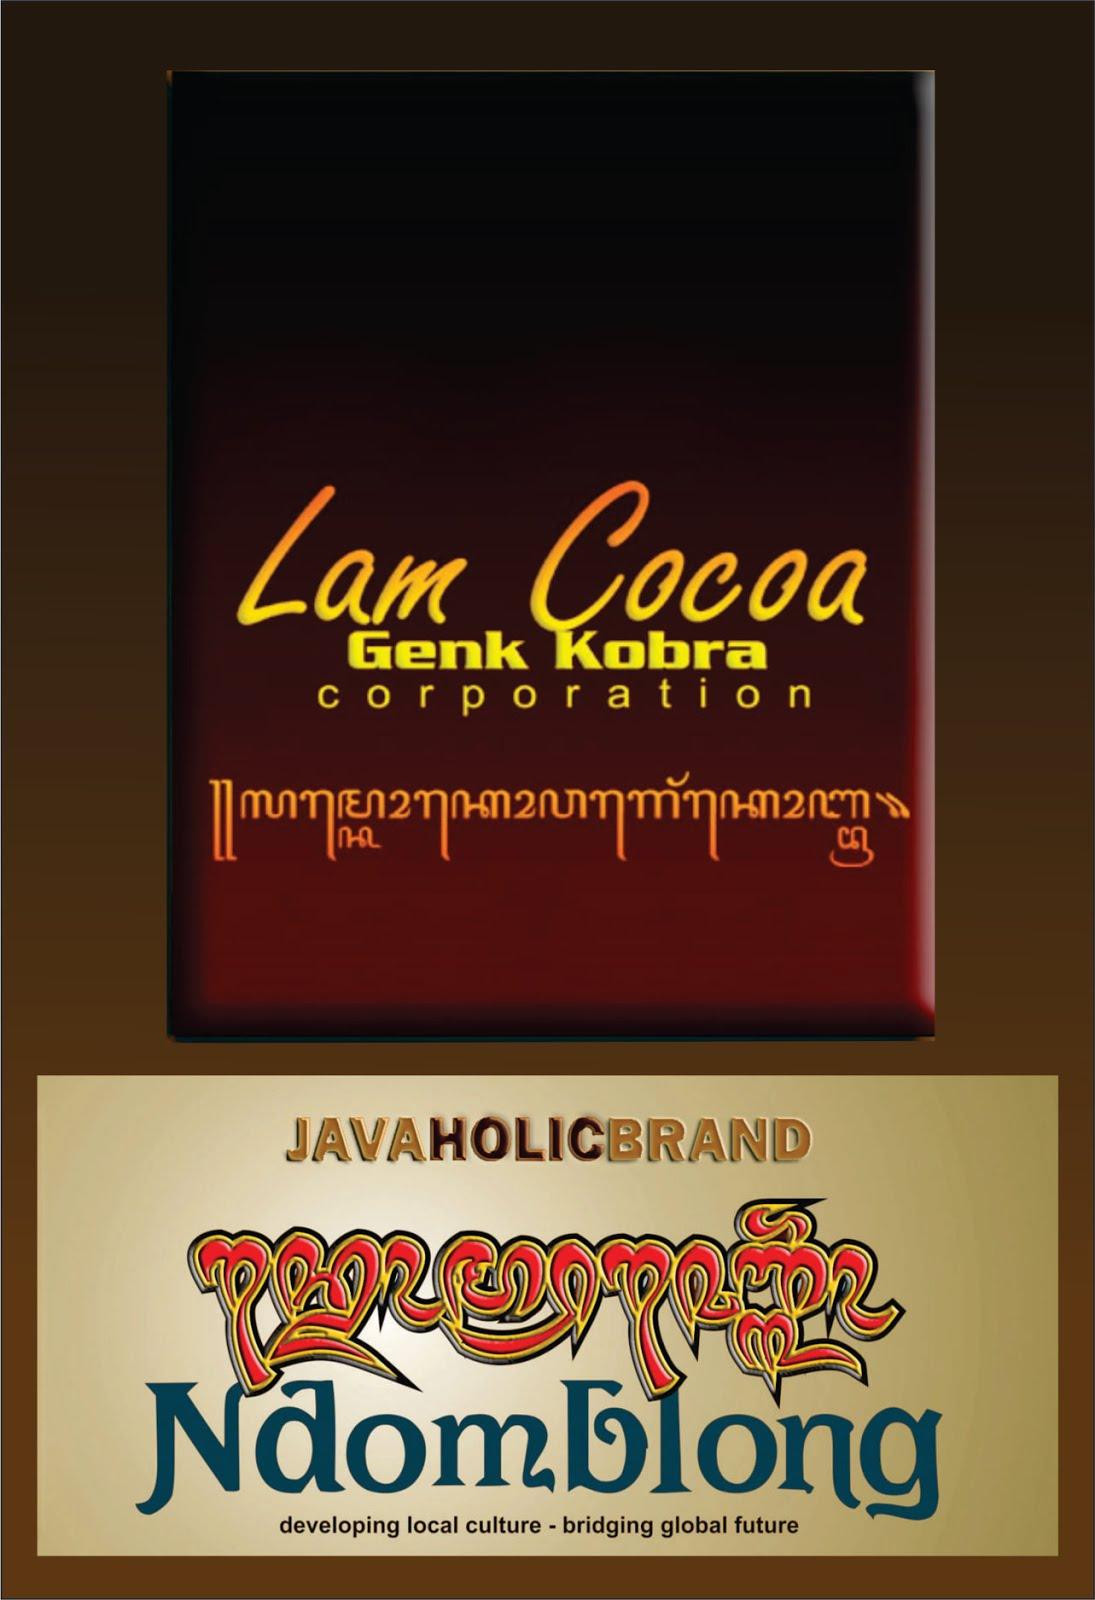 Lam Cocoa Genk Kobra